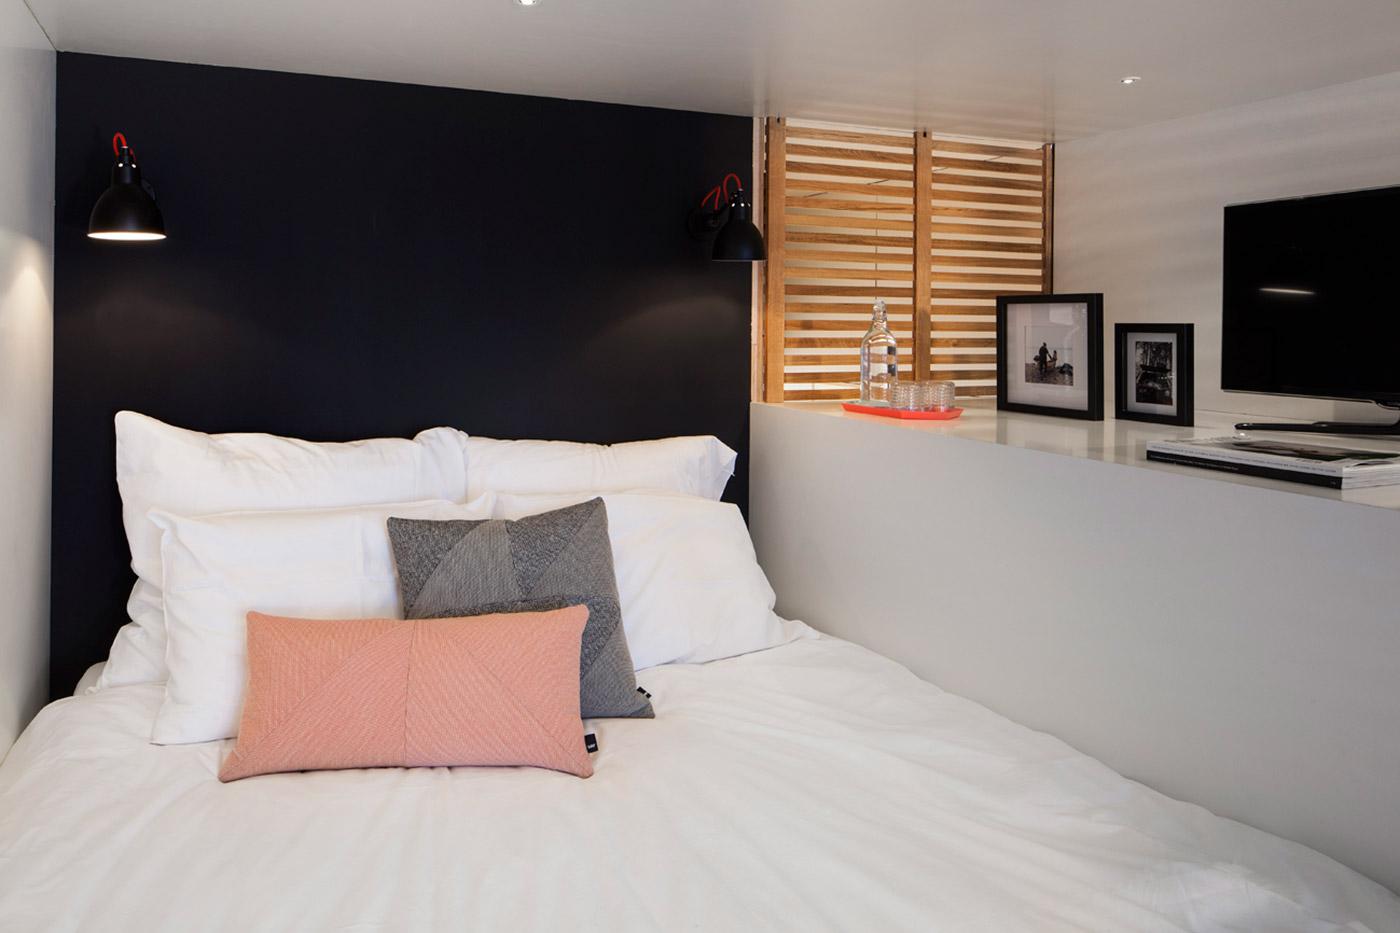 Спальня за деревянной решёткой